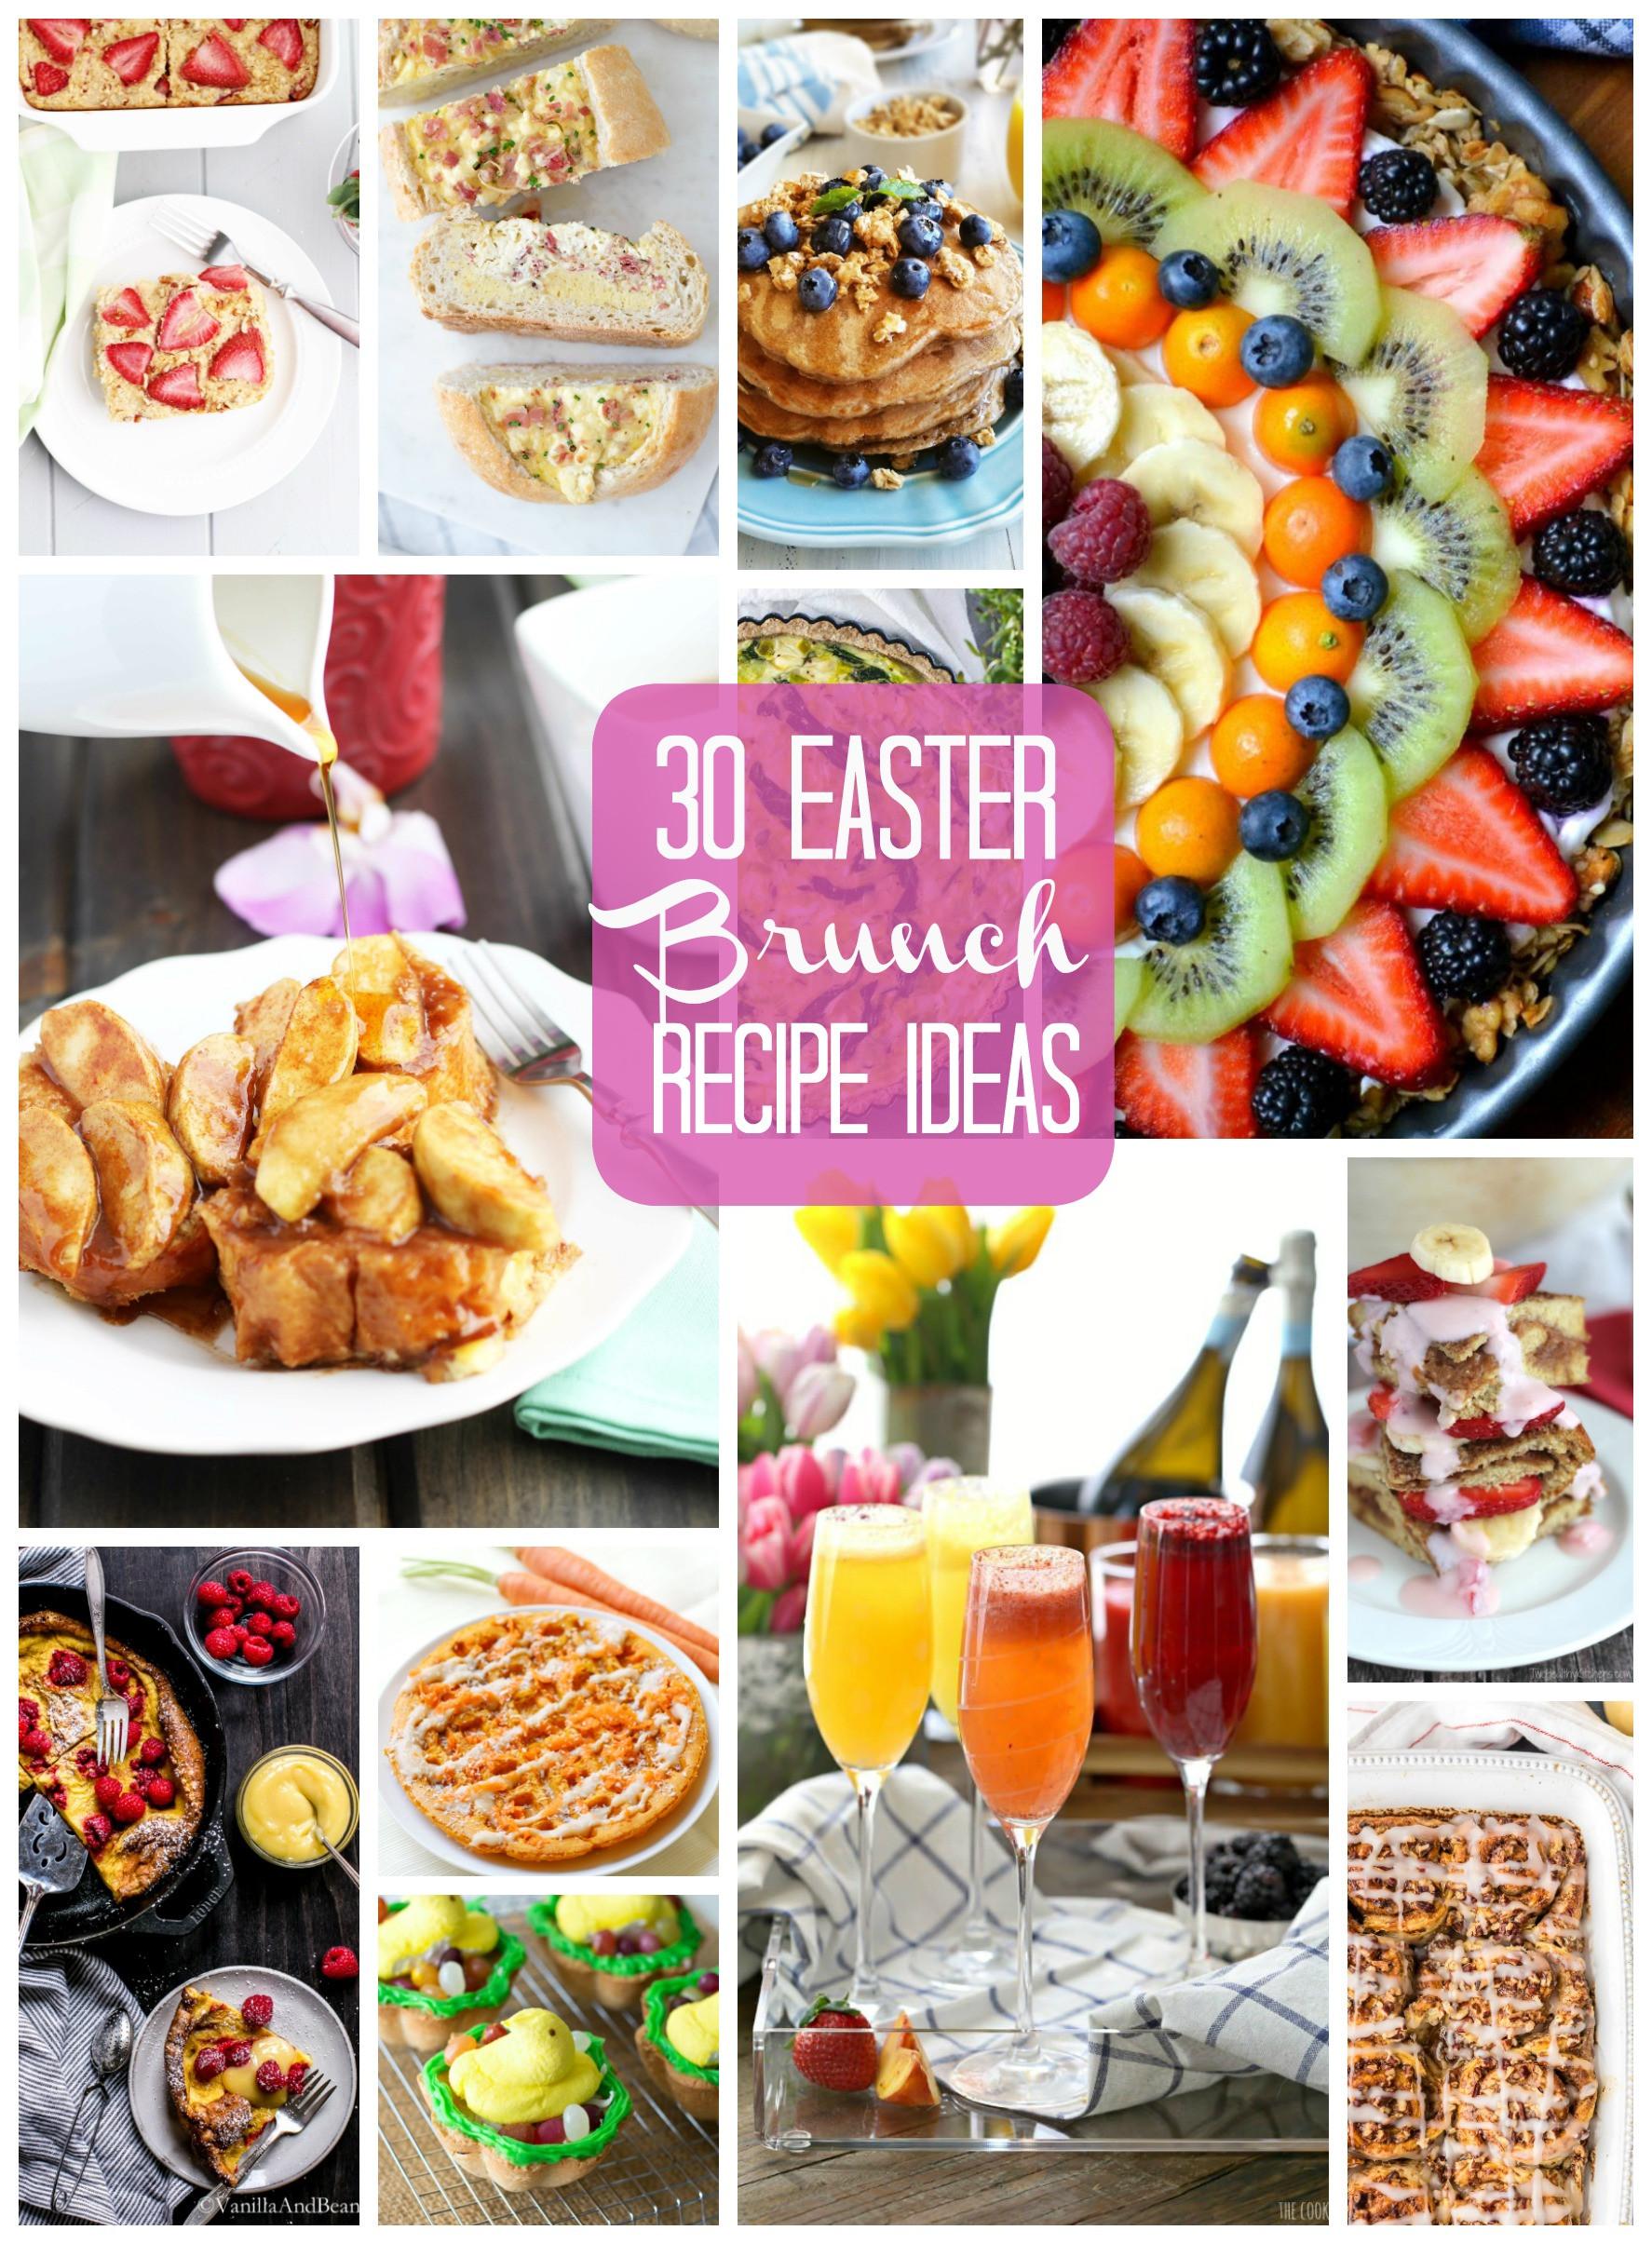 Easter Breakfast Recipes  30 Easter Brunch Recipe Ideas